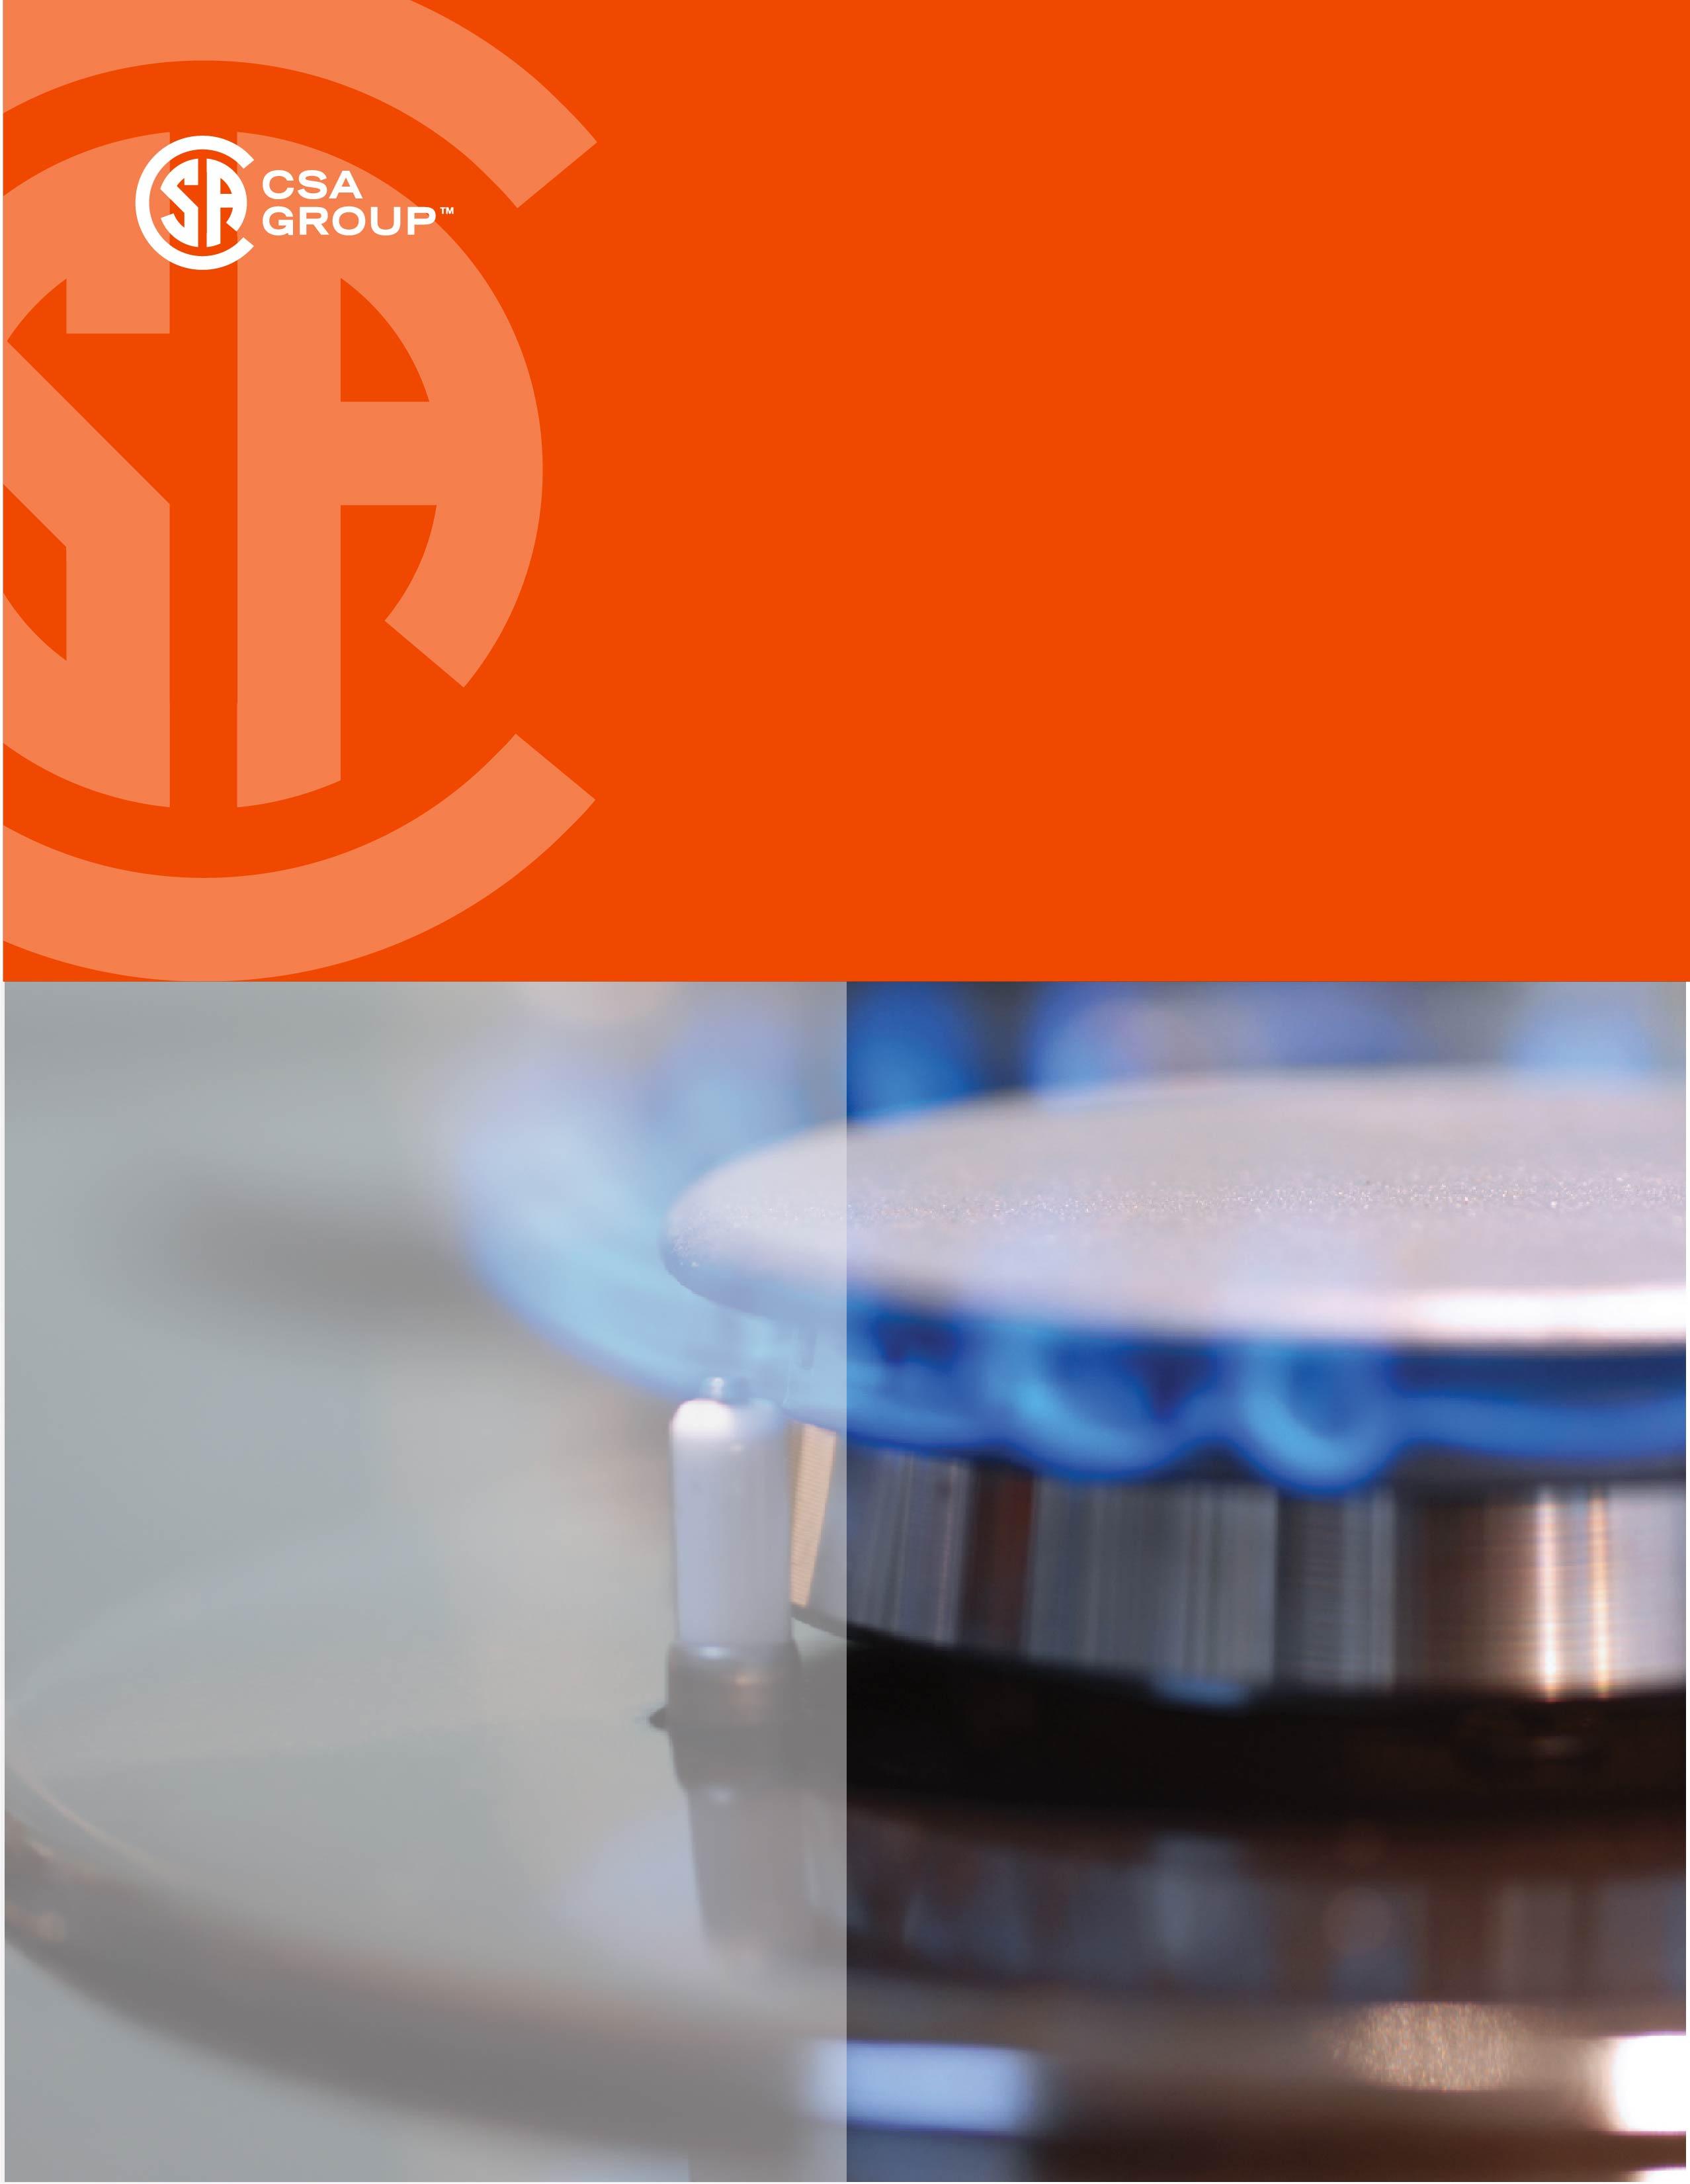 GAS TRADE TRAINING UNIT 15, 7th Edition (2020)